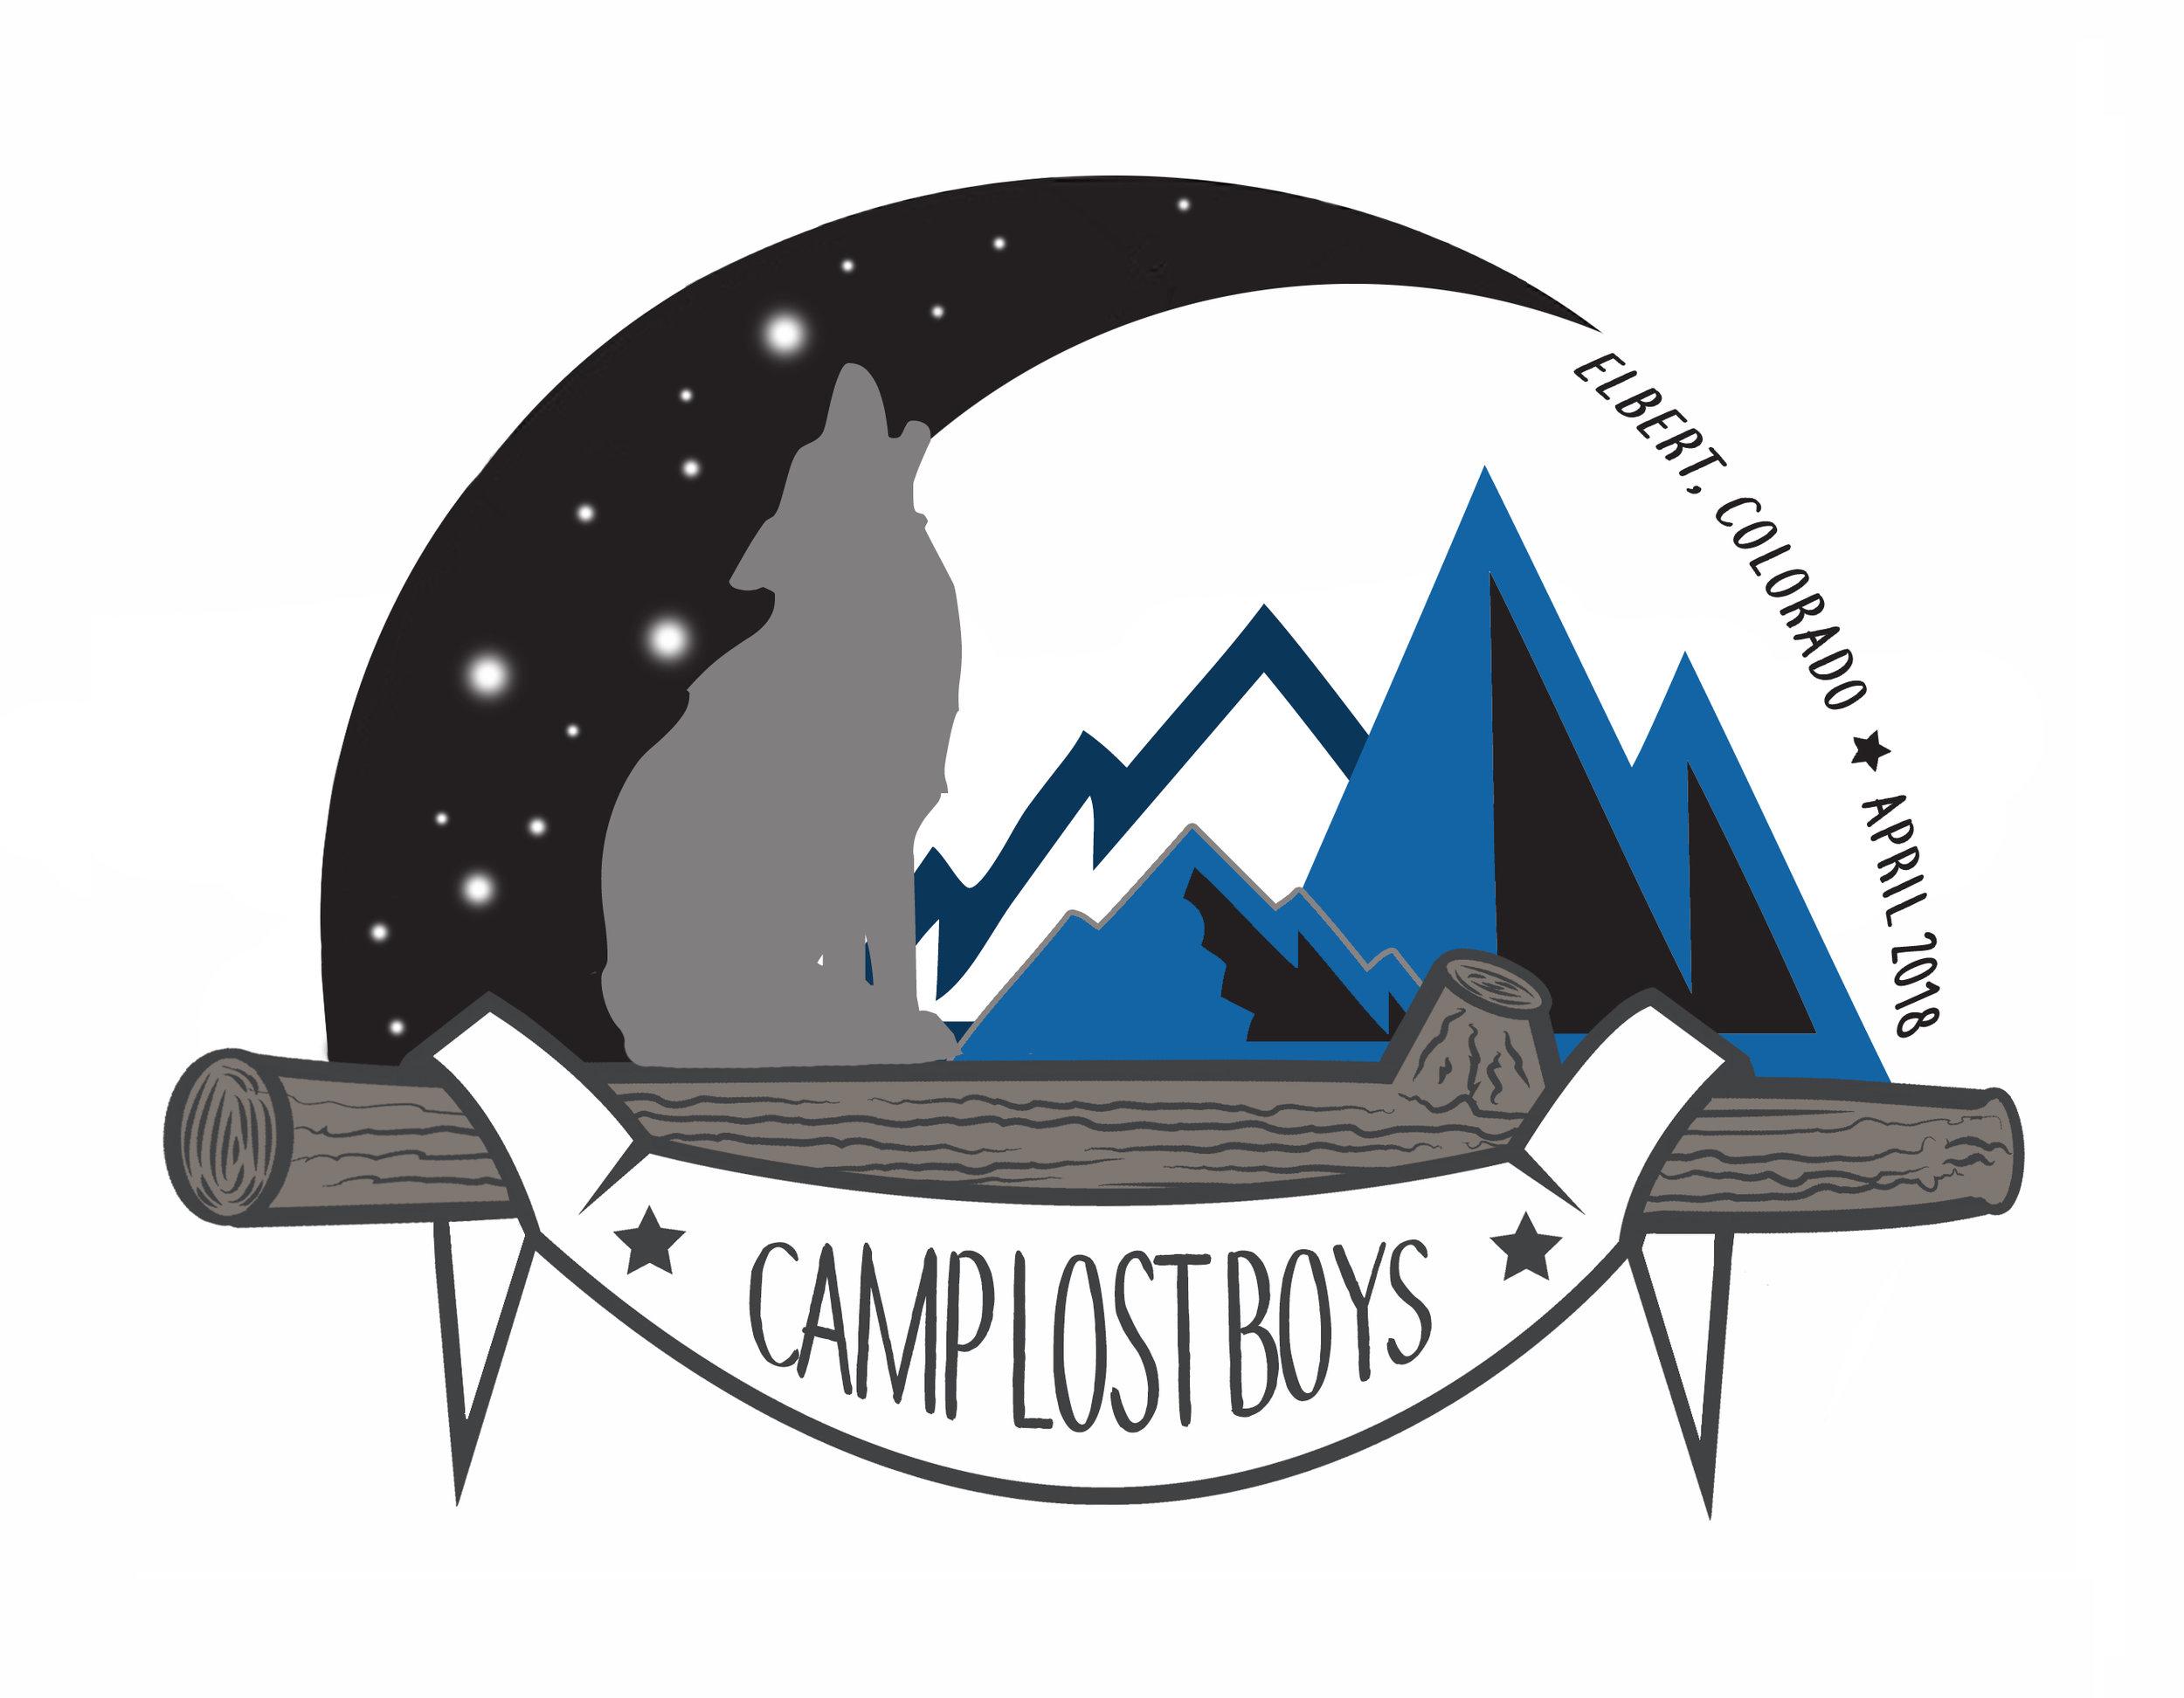 Camp lost boys colorado final flat.jpg